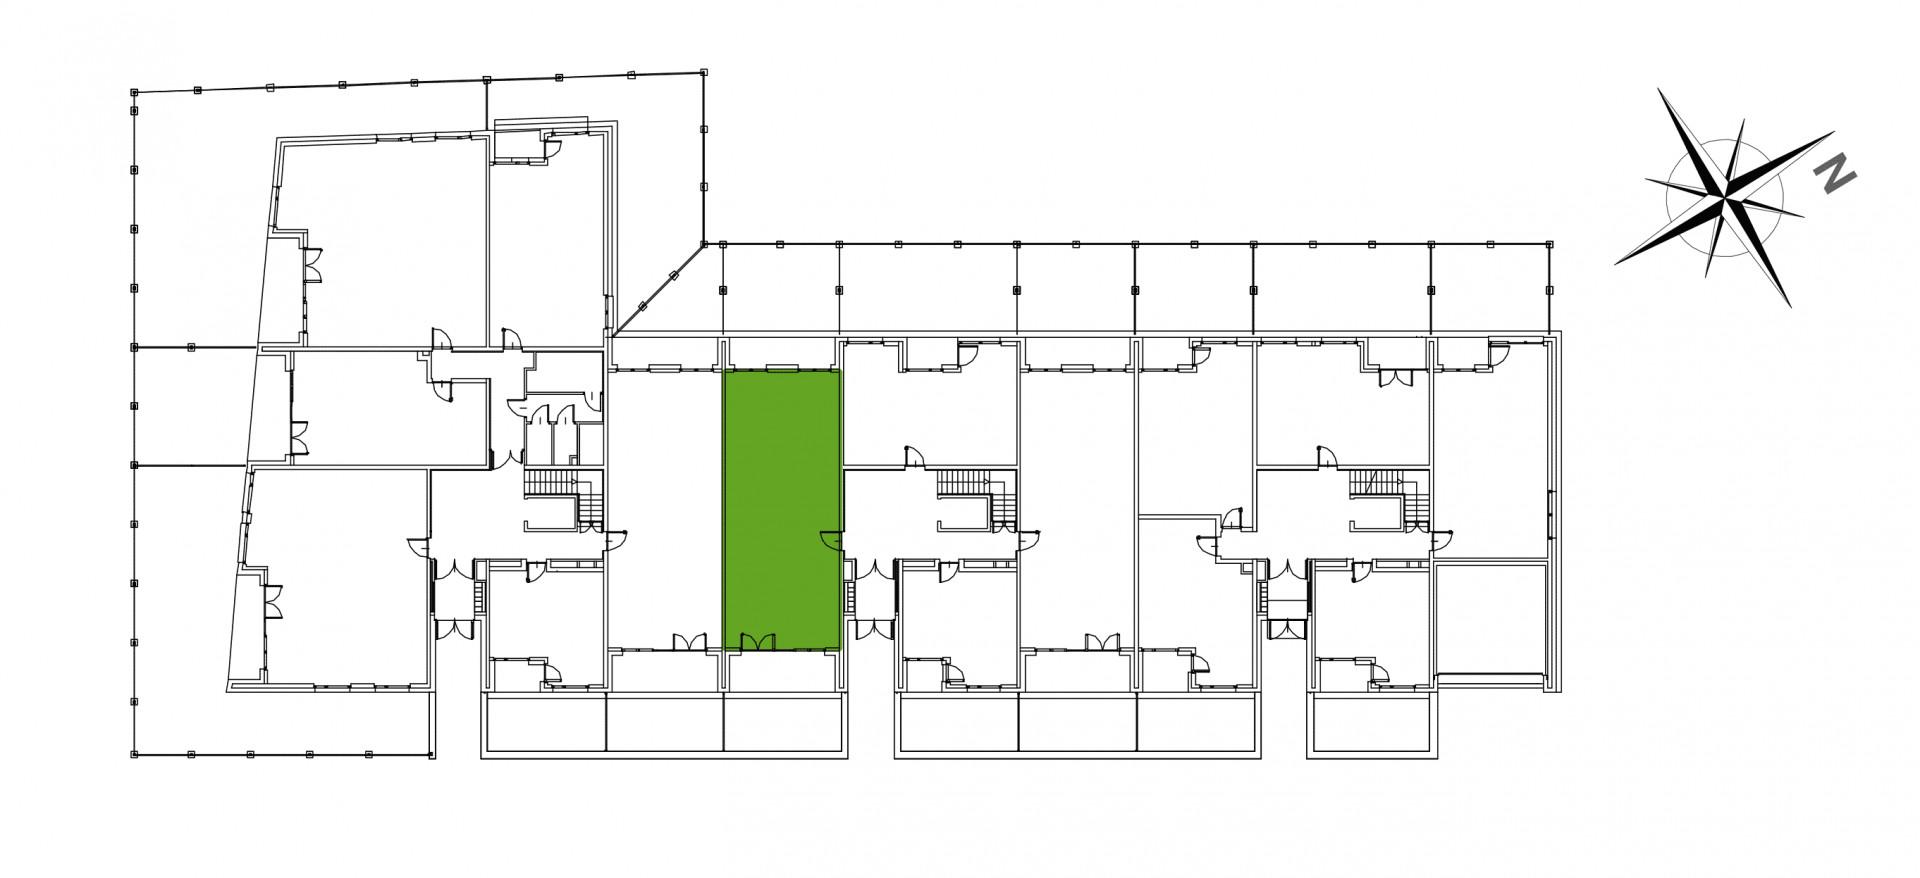 Mazowiecka 72 / apartament nr 24 rzut 2